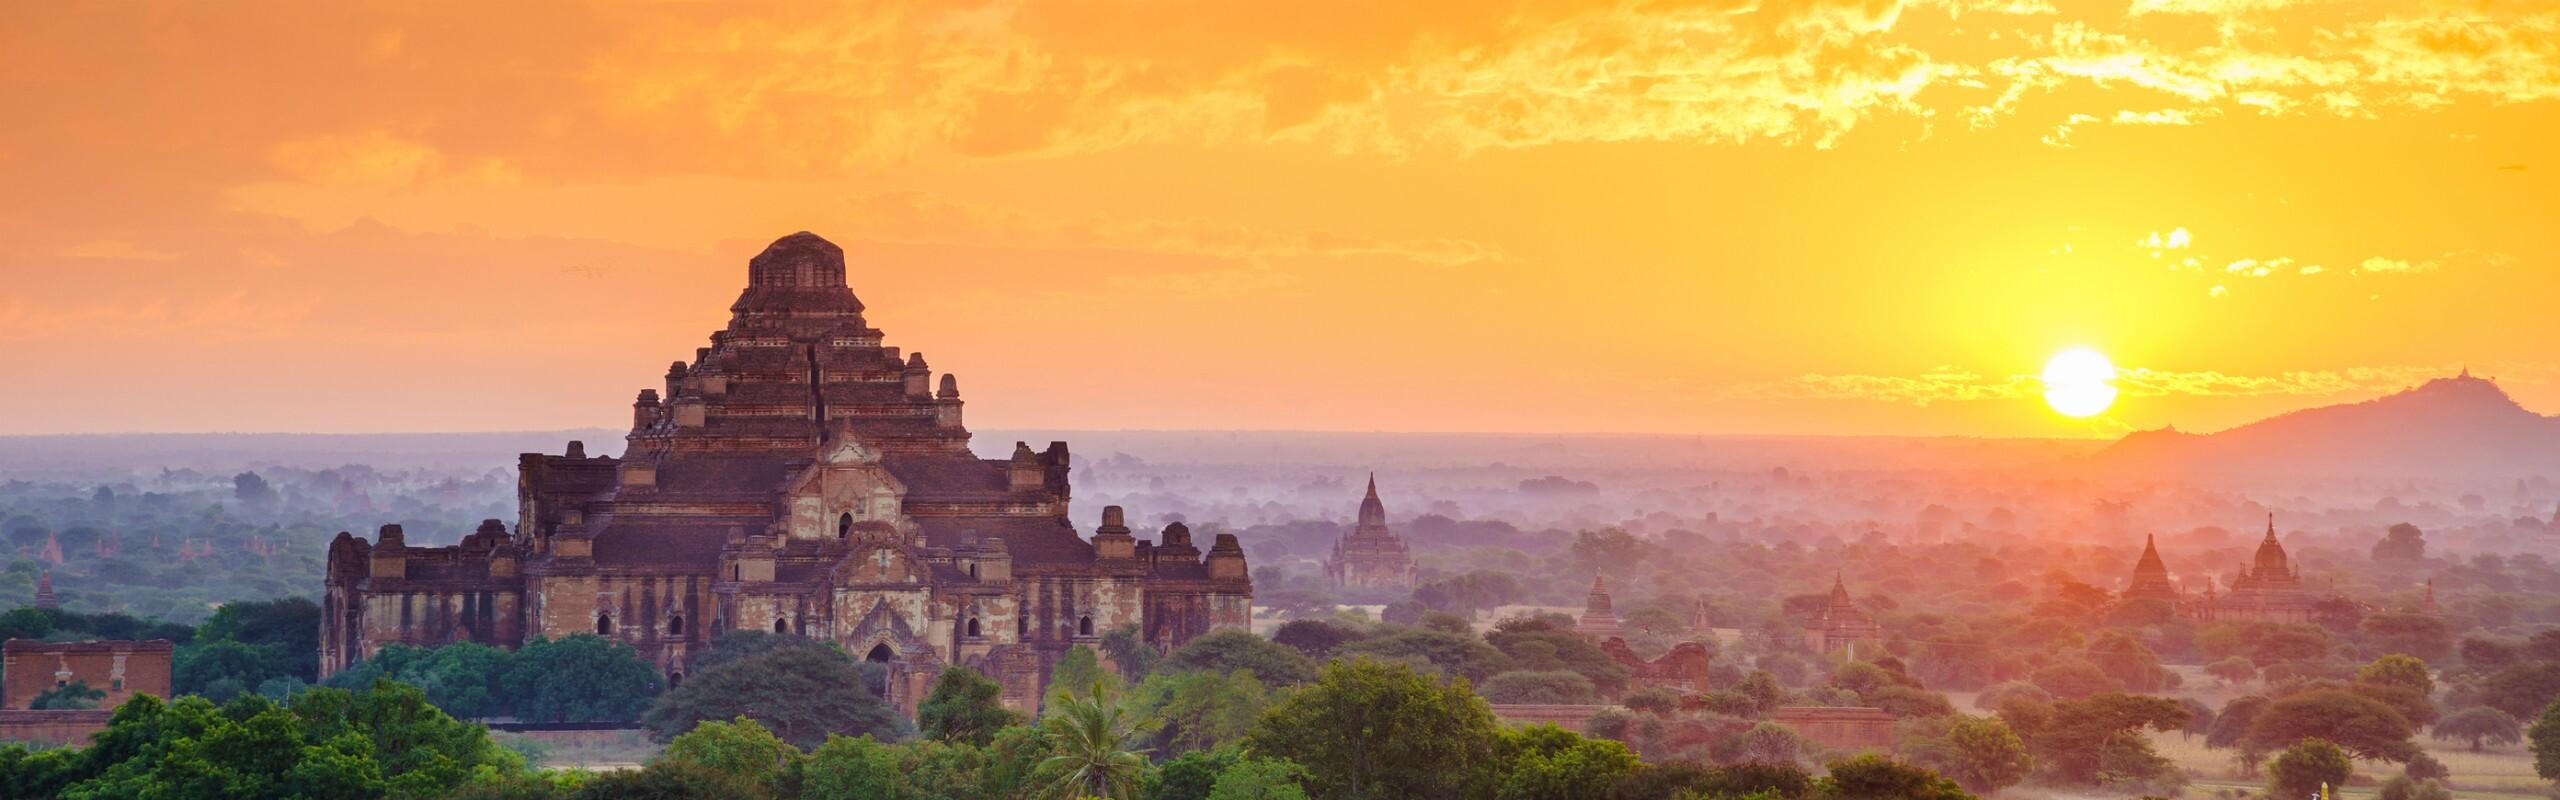 October Weather in Bagan